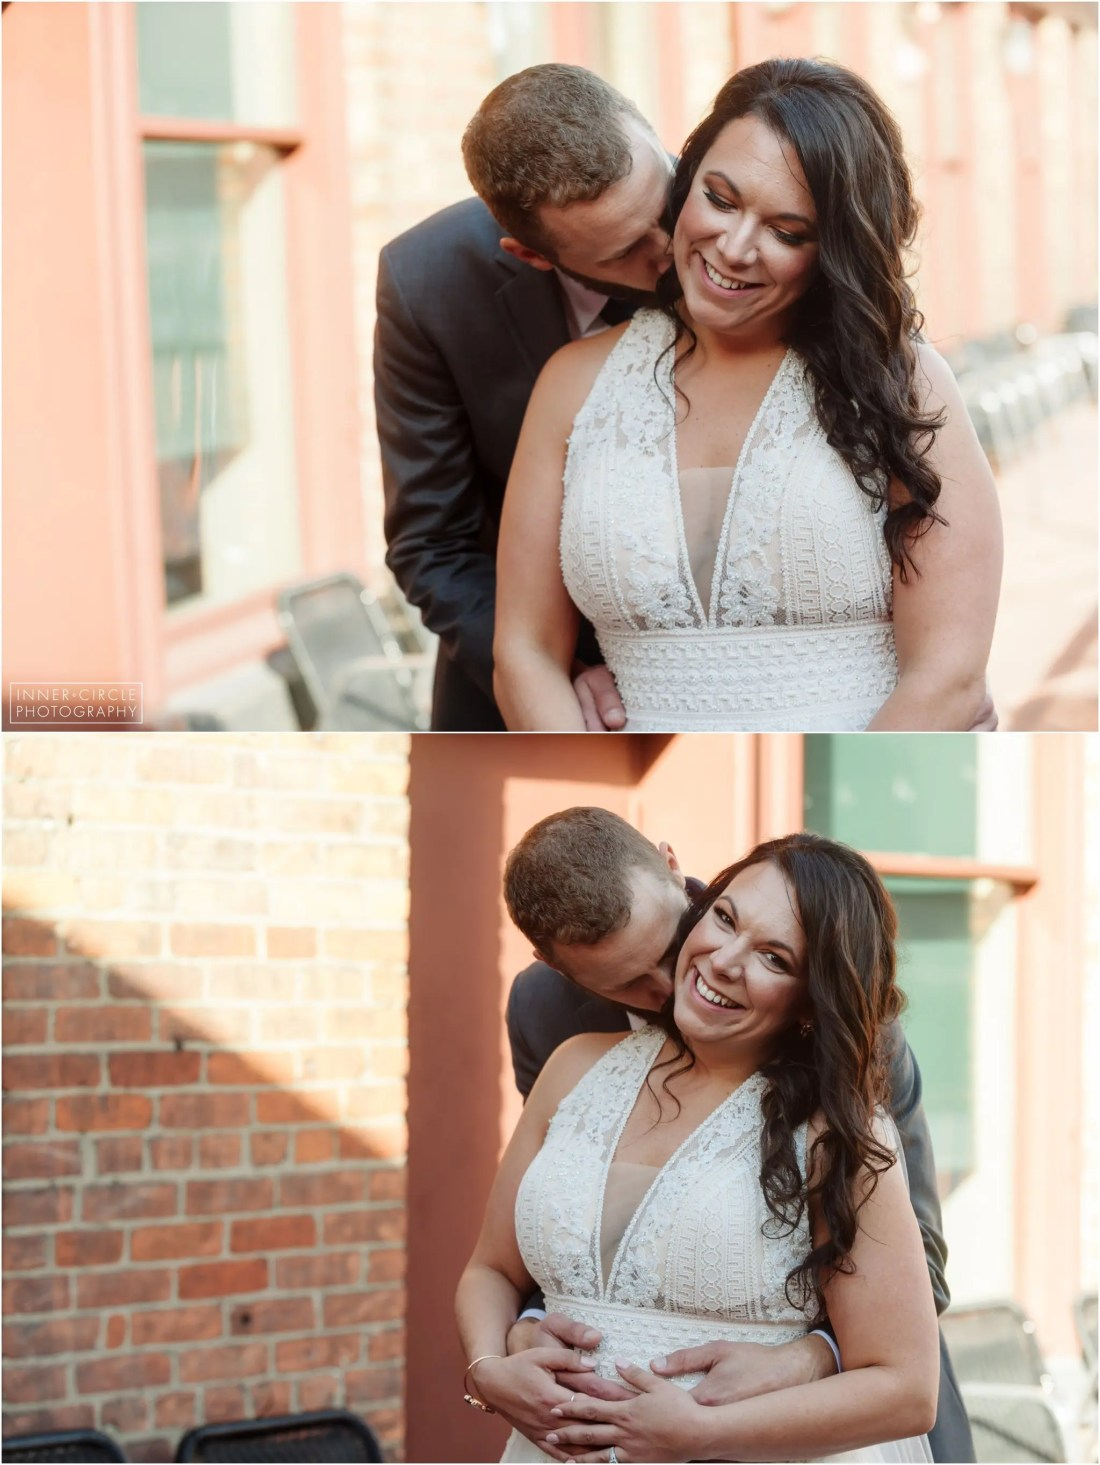 JoeMelissa_WED_InnerCirclePhoto_233 Joe + Melissa :: MARRIED!